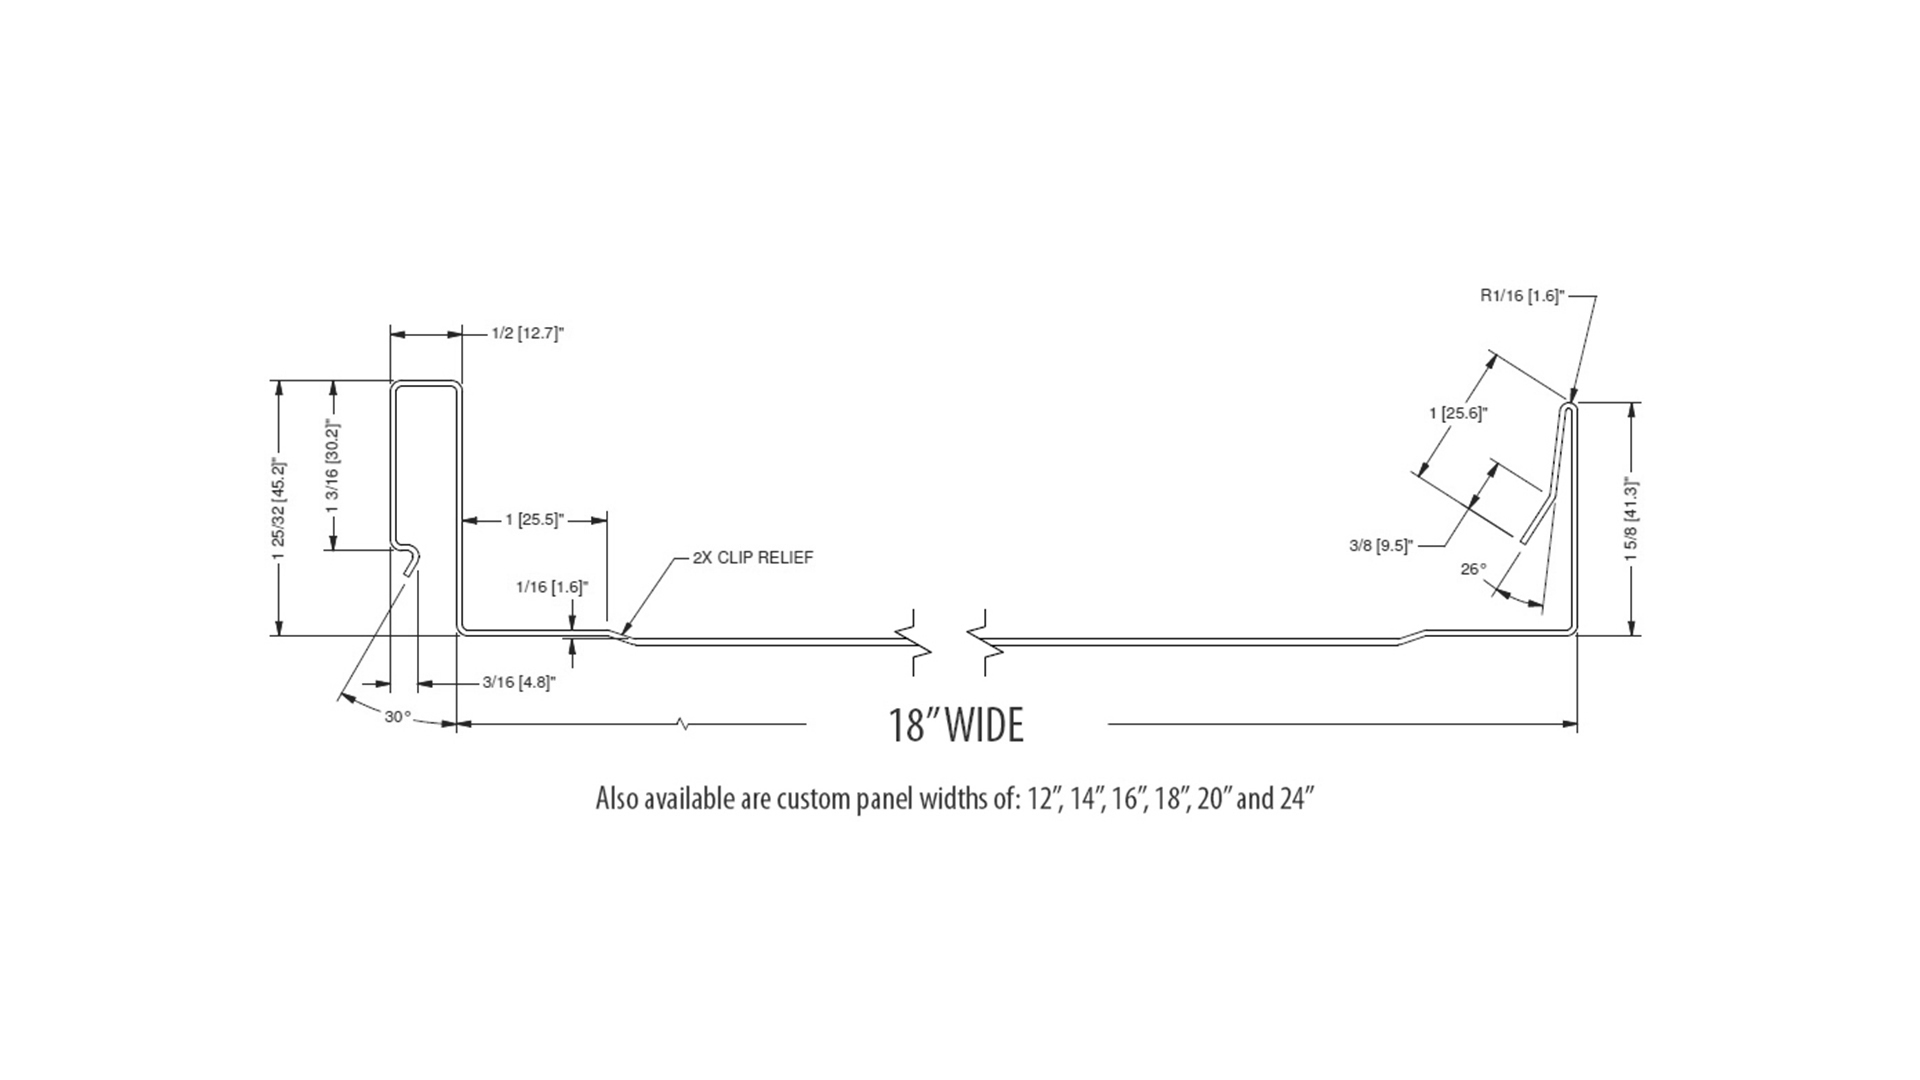 https://f.hubspotusercontent30.net/hubfs/6069238/images/line-drawings/standing-seam-line-drawing.jpg